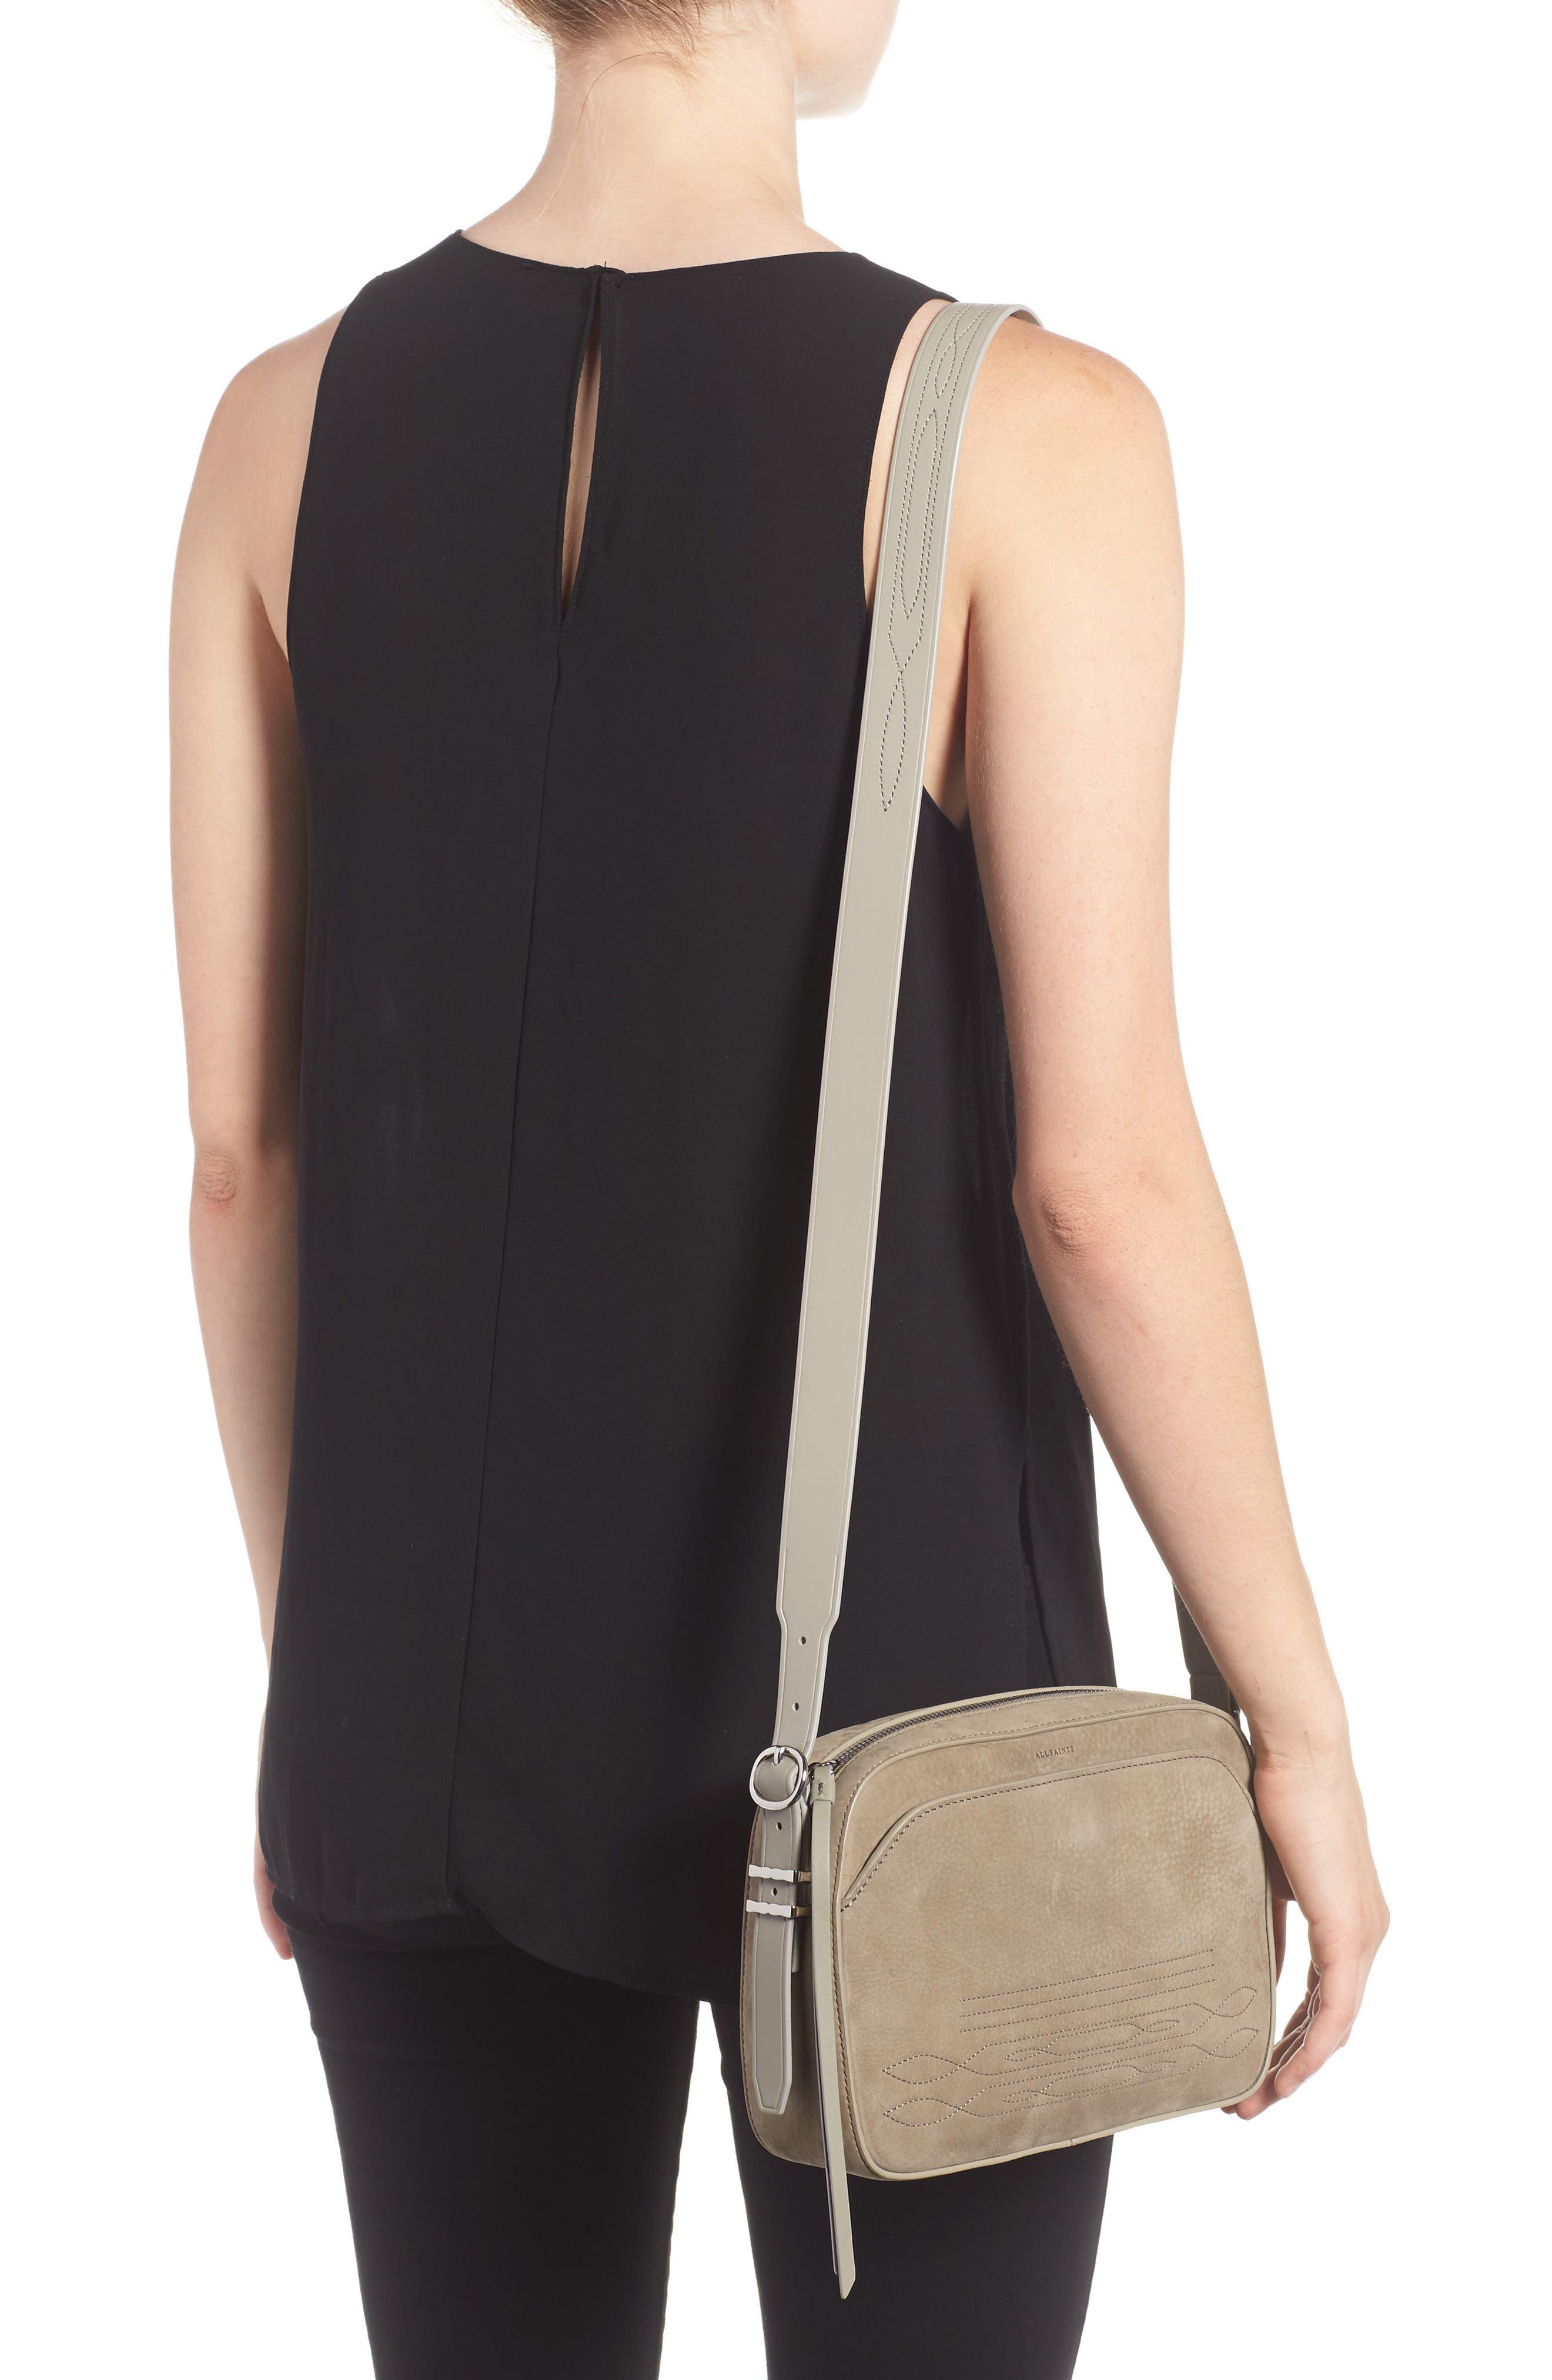 Cooper Nubuck Leather Shoulder Bag,                             Alternate thumbnail 2, color,                             Light Cement Grey